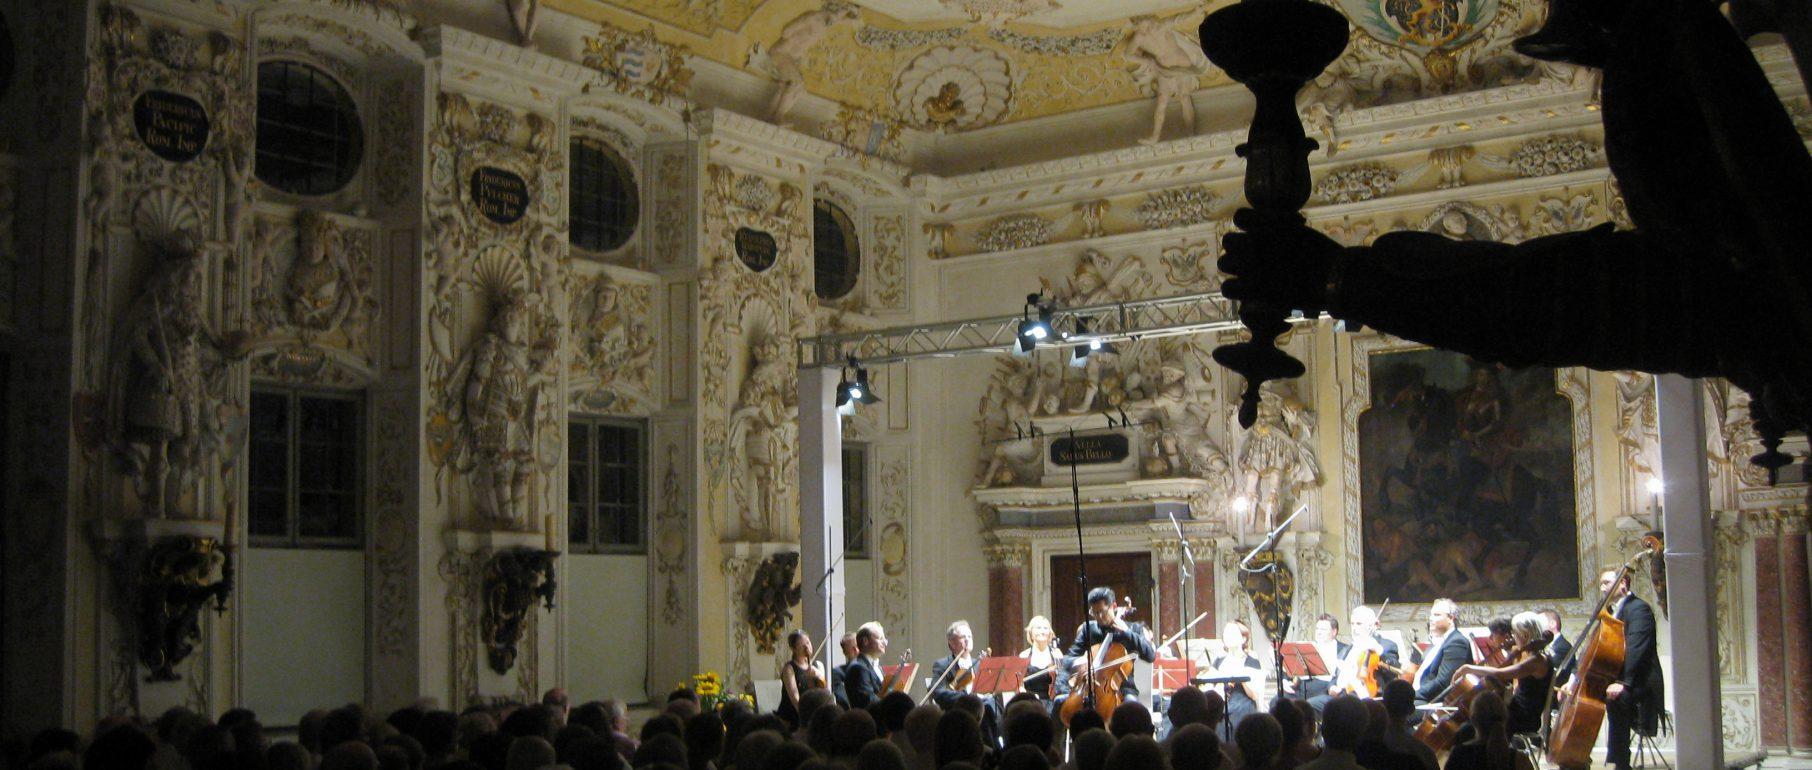 Auftritt im Kaisersaal des Salemer Schlosses